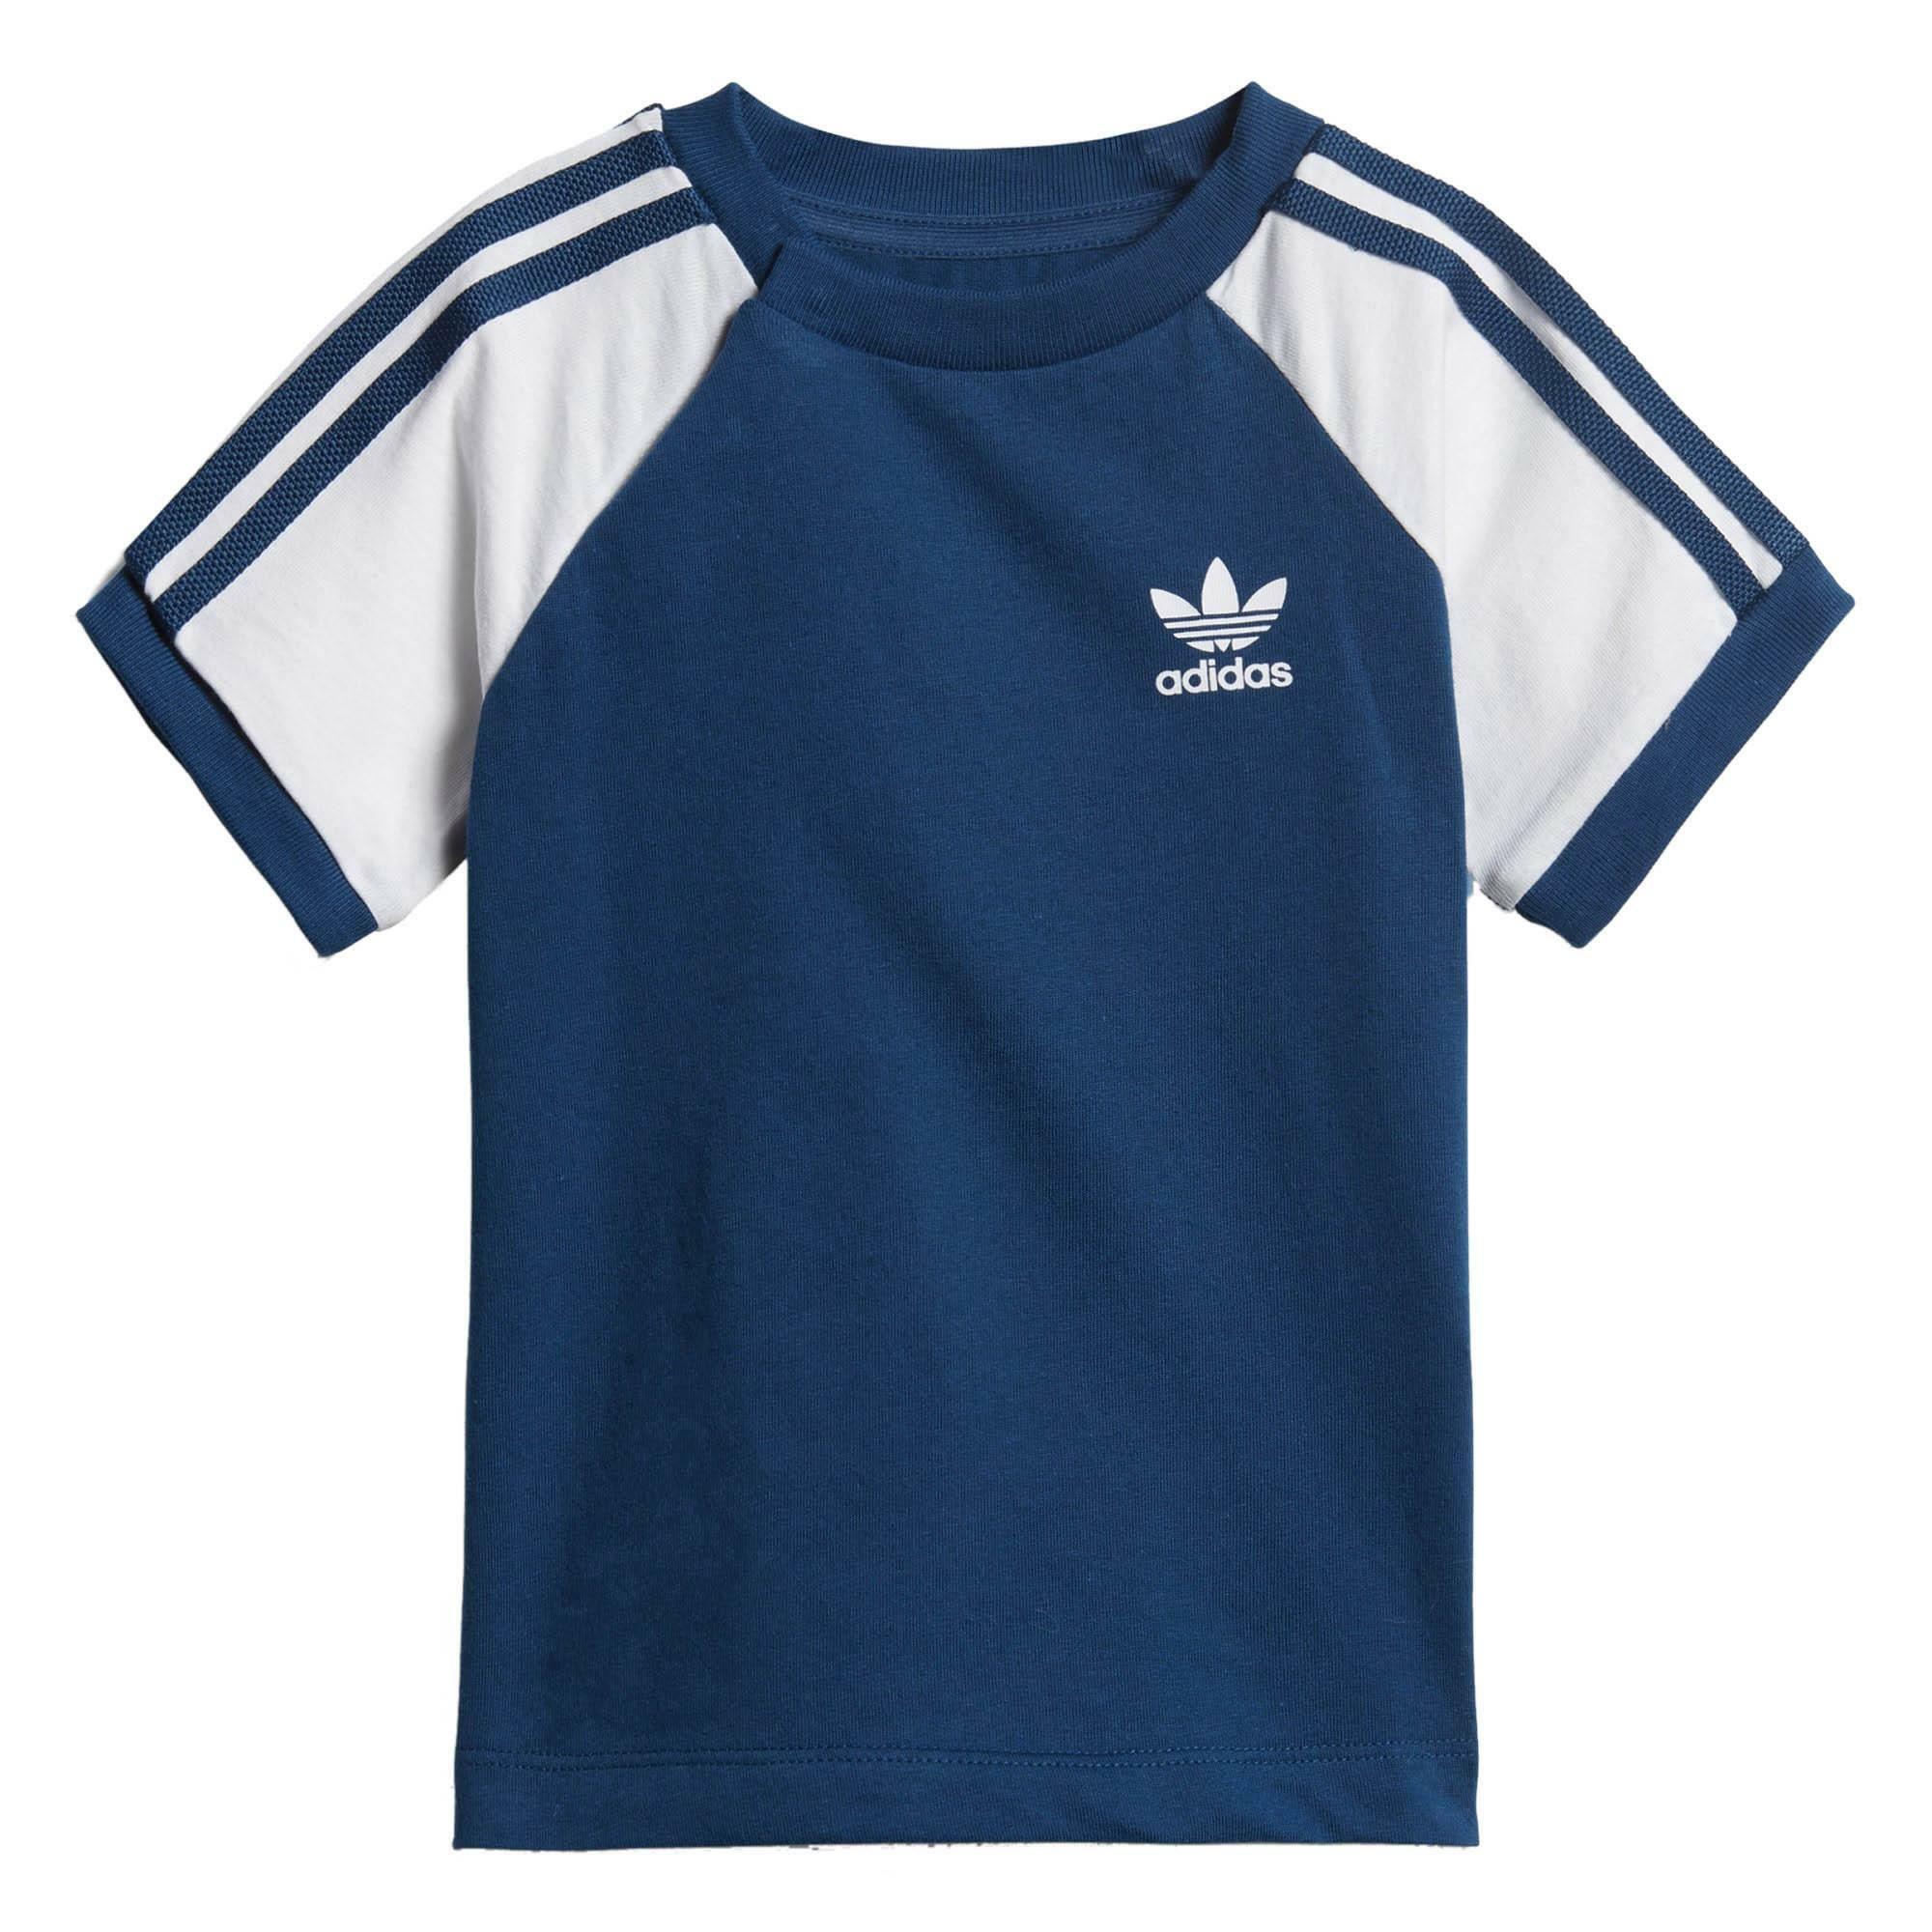 adidas 3stripes tee t-shirt bambino blu dv2825